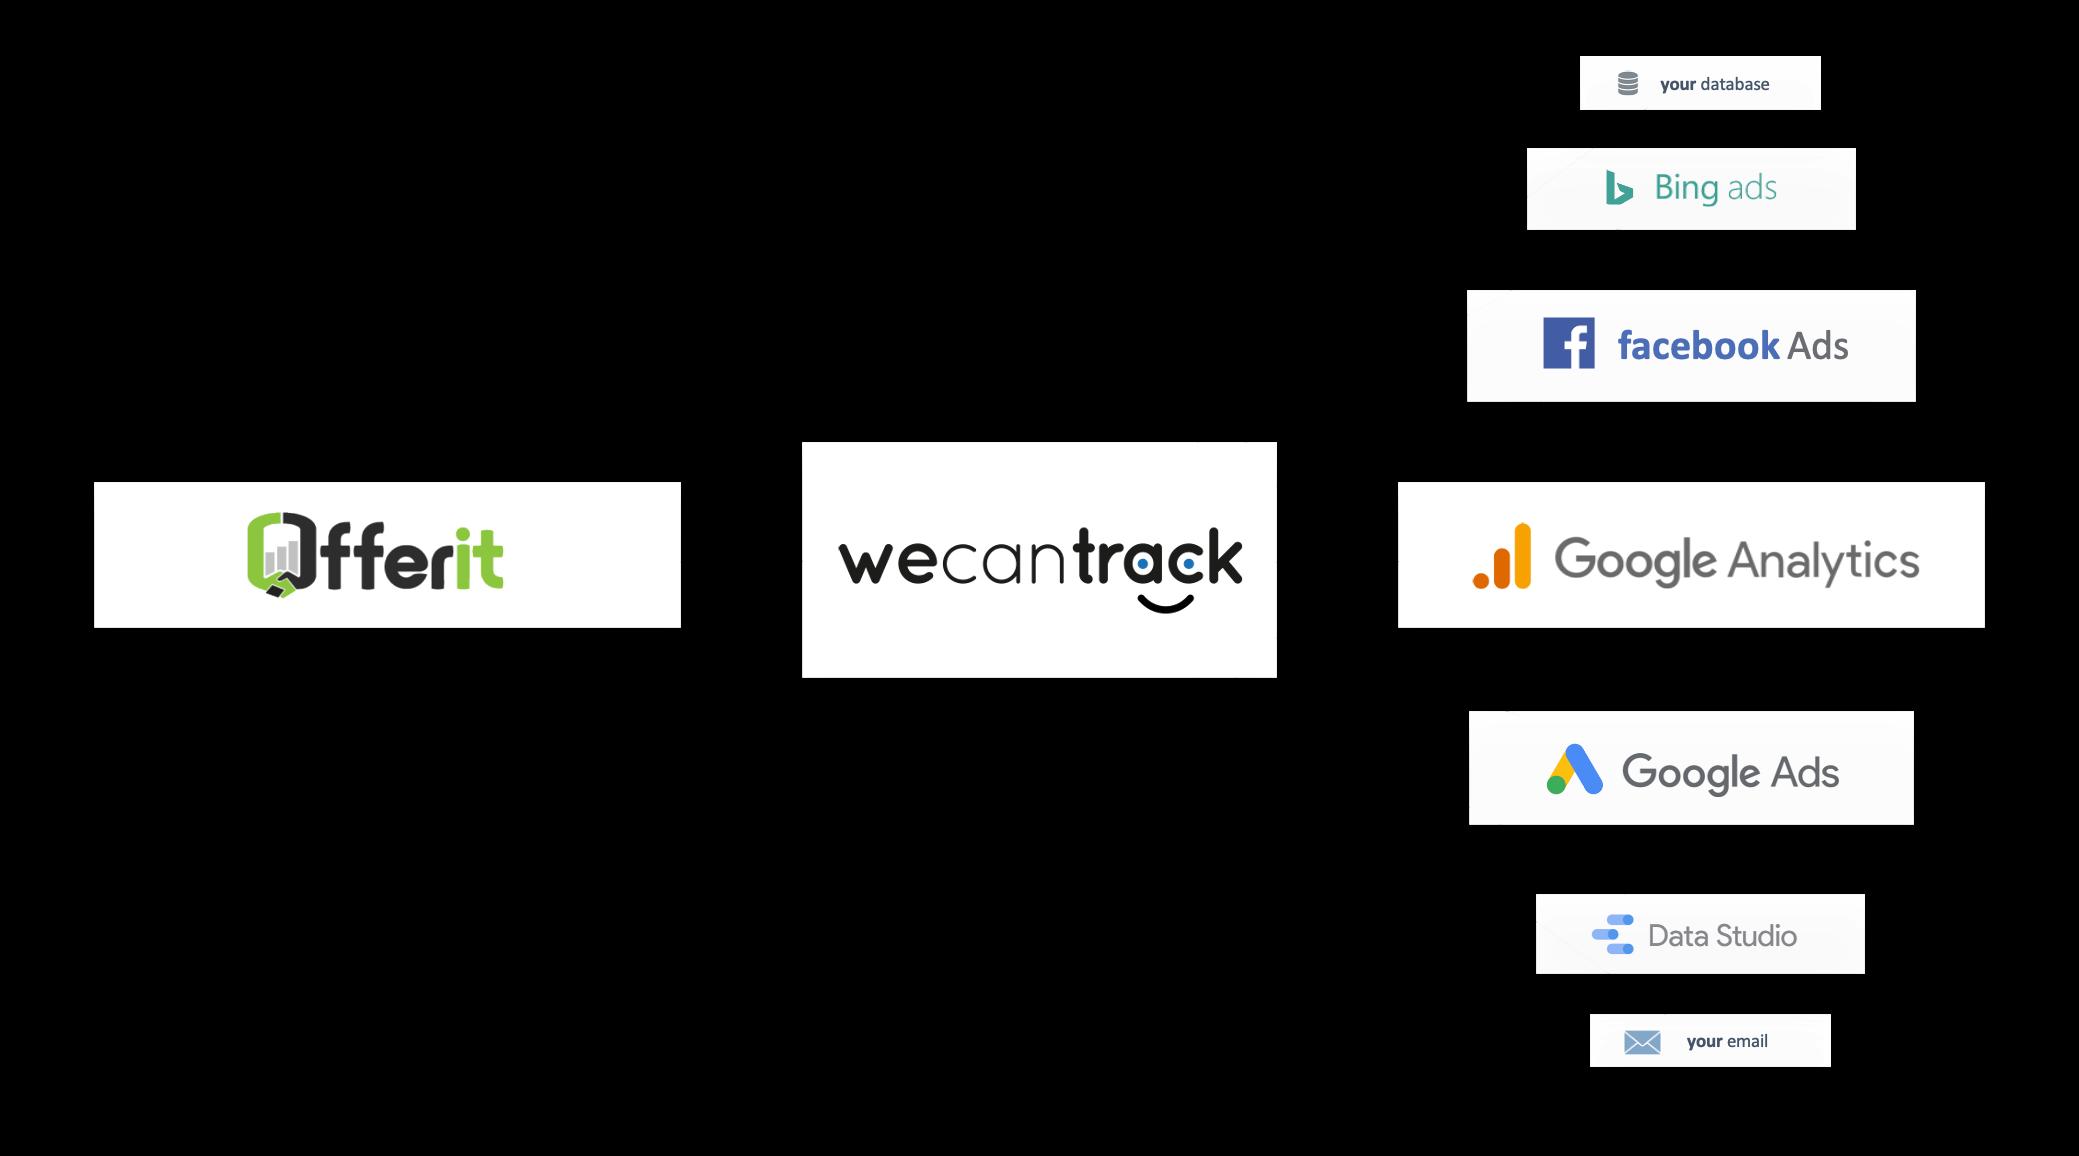 integrate-offerit-affiliate-conversions-via-postback-url